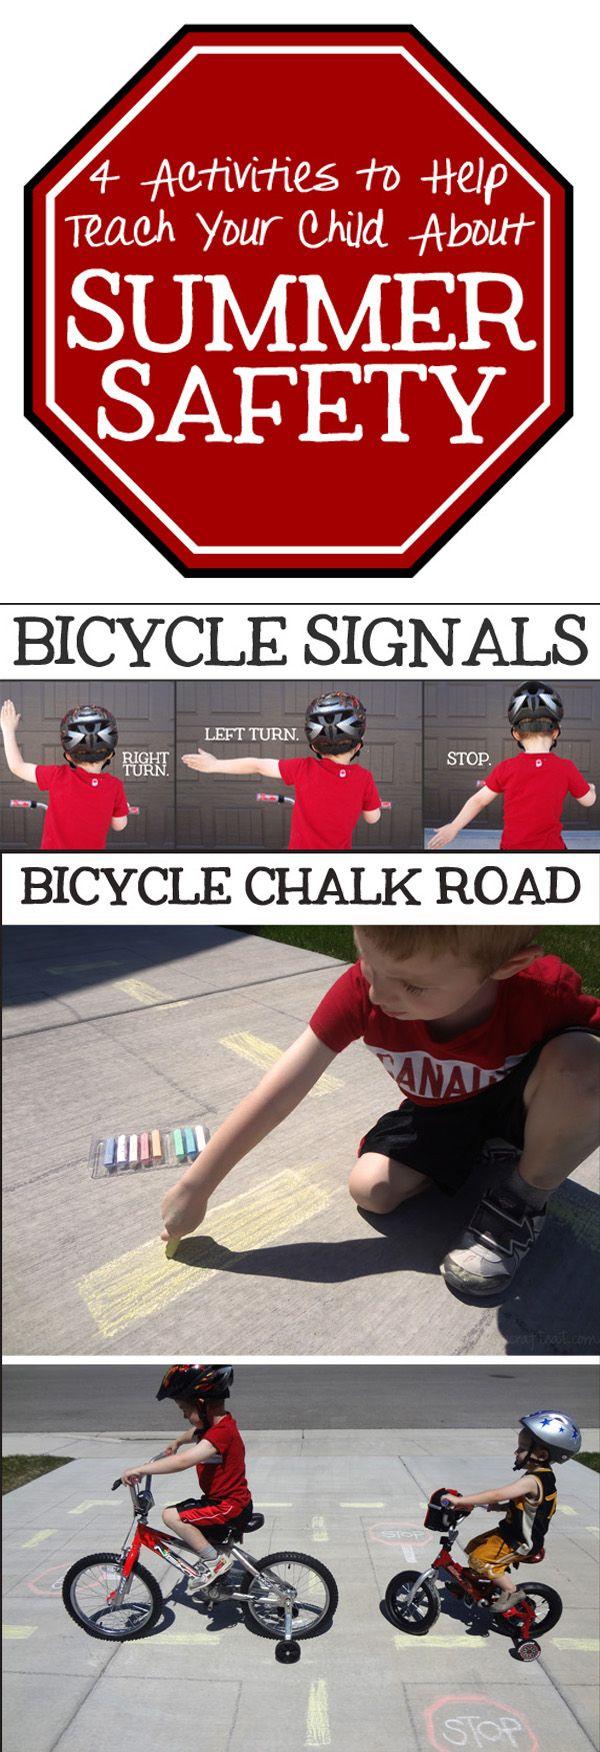 Summer safety,(in celebration of National Bike Safety Month!) #BikeMonth